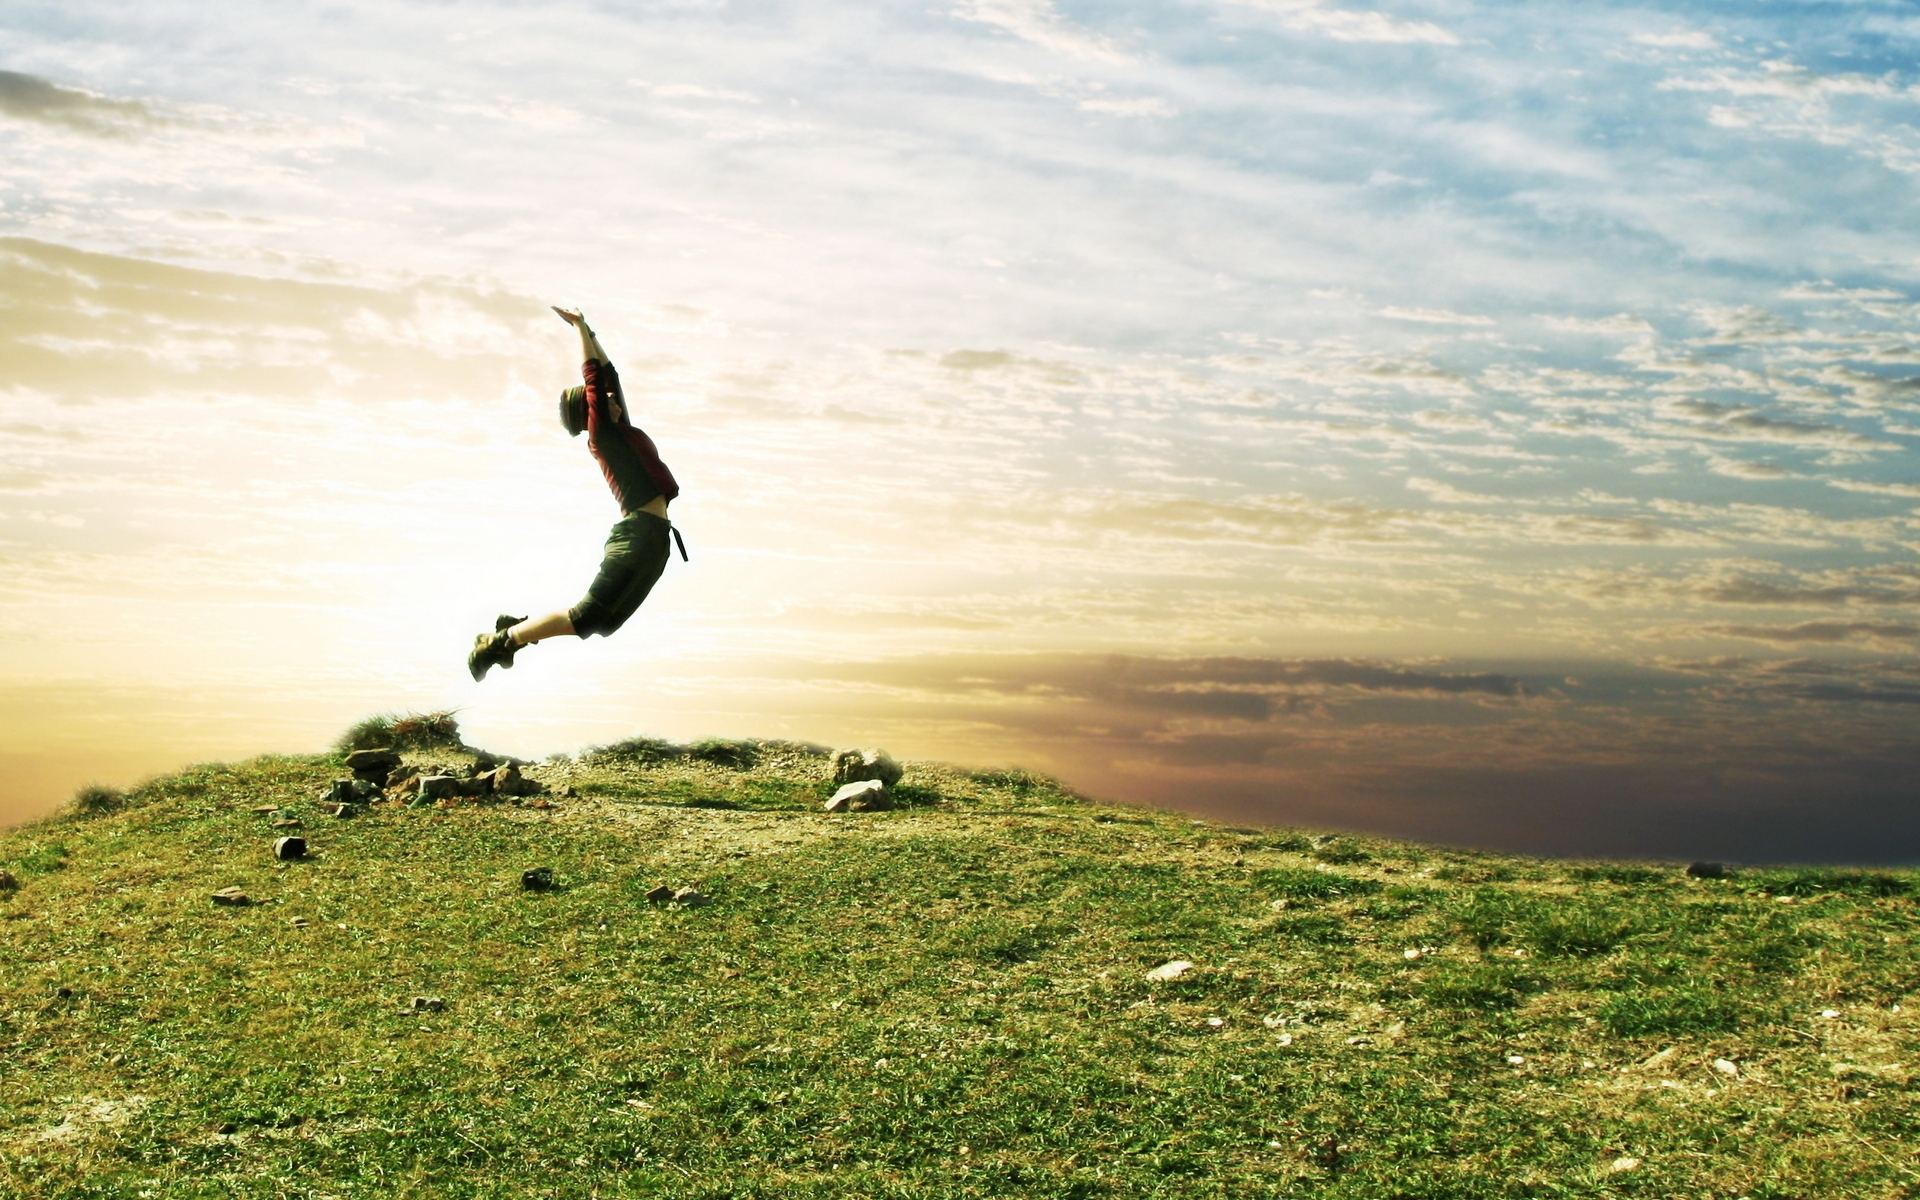 jump_people_field_grass_sky_nature_54406_1920x1200.jpg